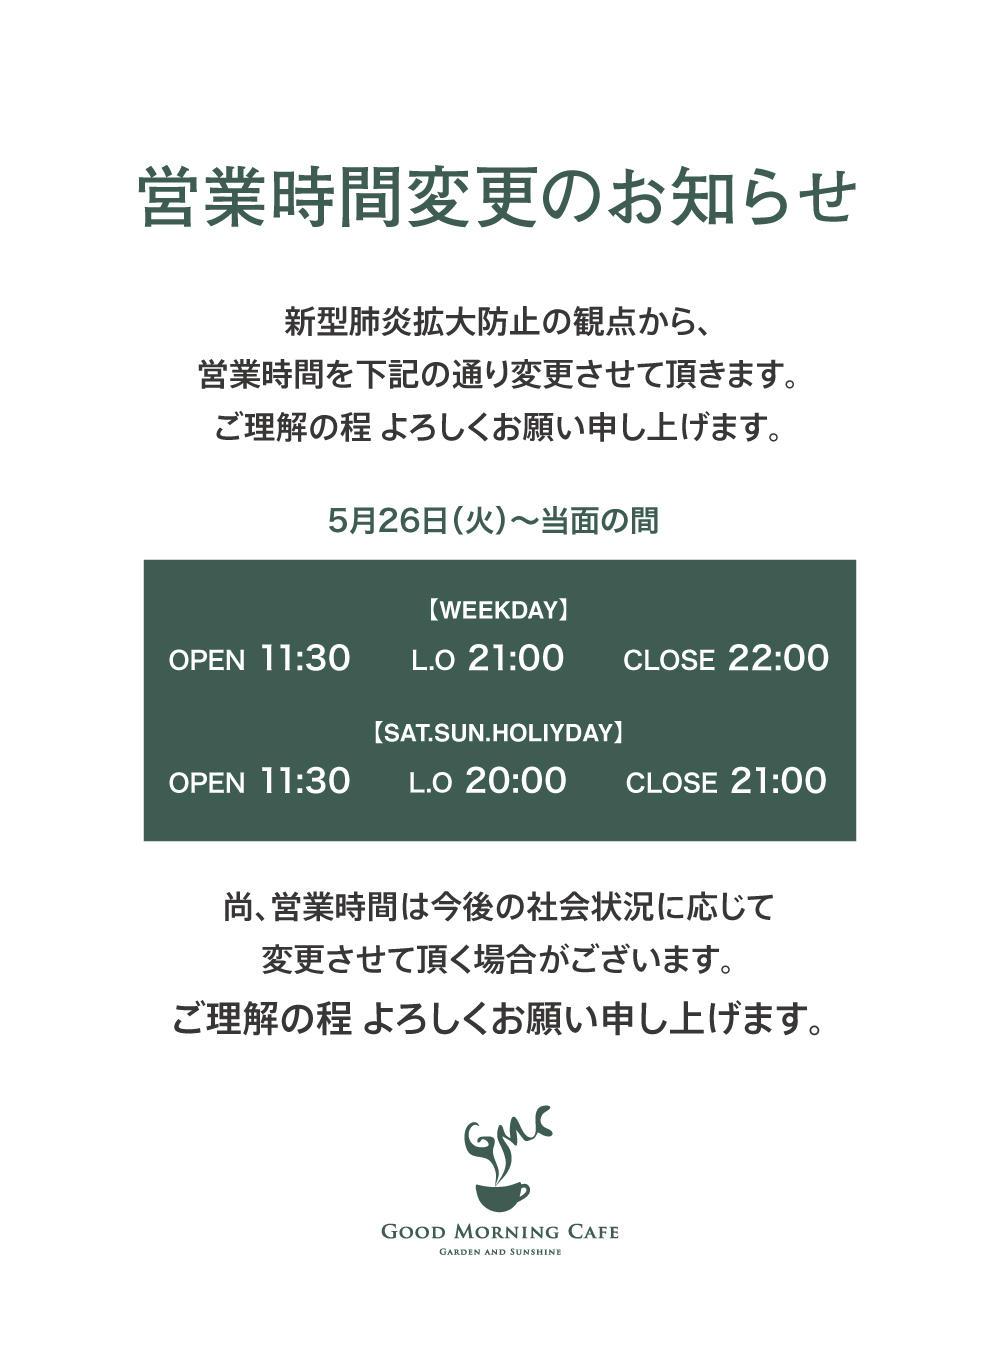 gmcsi_200526_営業時間変更.jpg